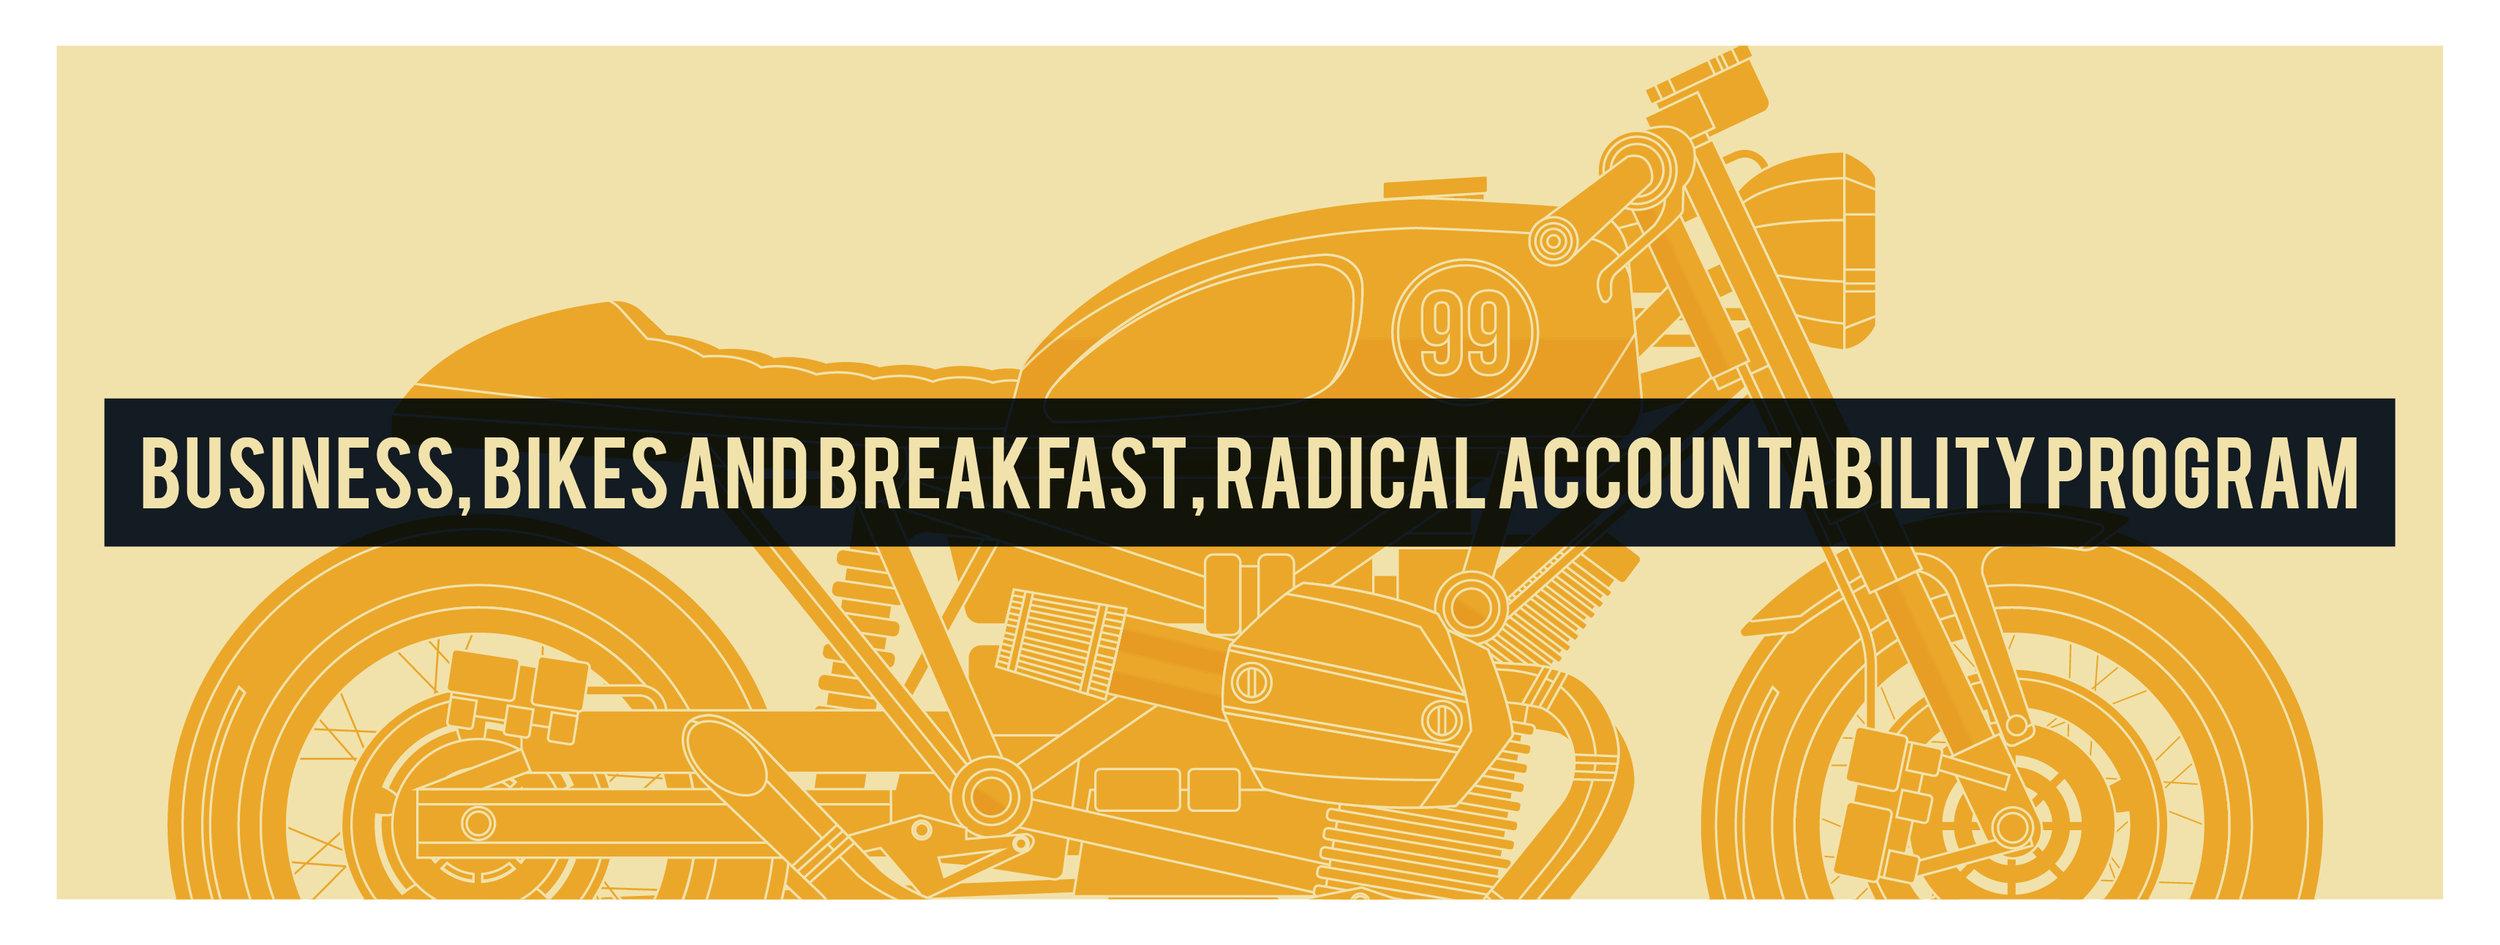 Business, Bikes and Breakfast Radical Accountability Program